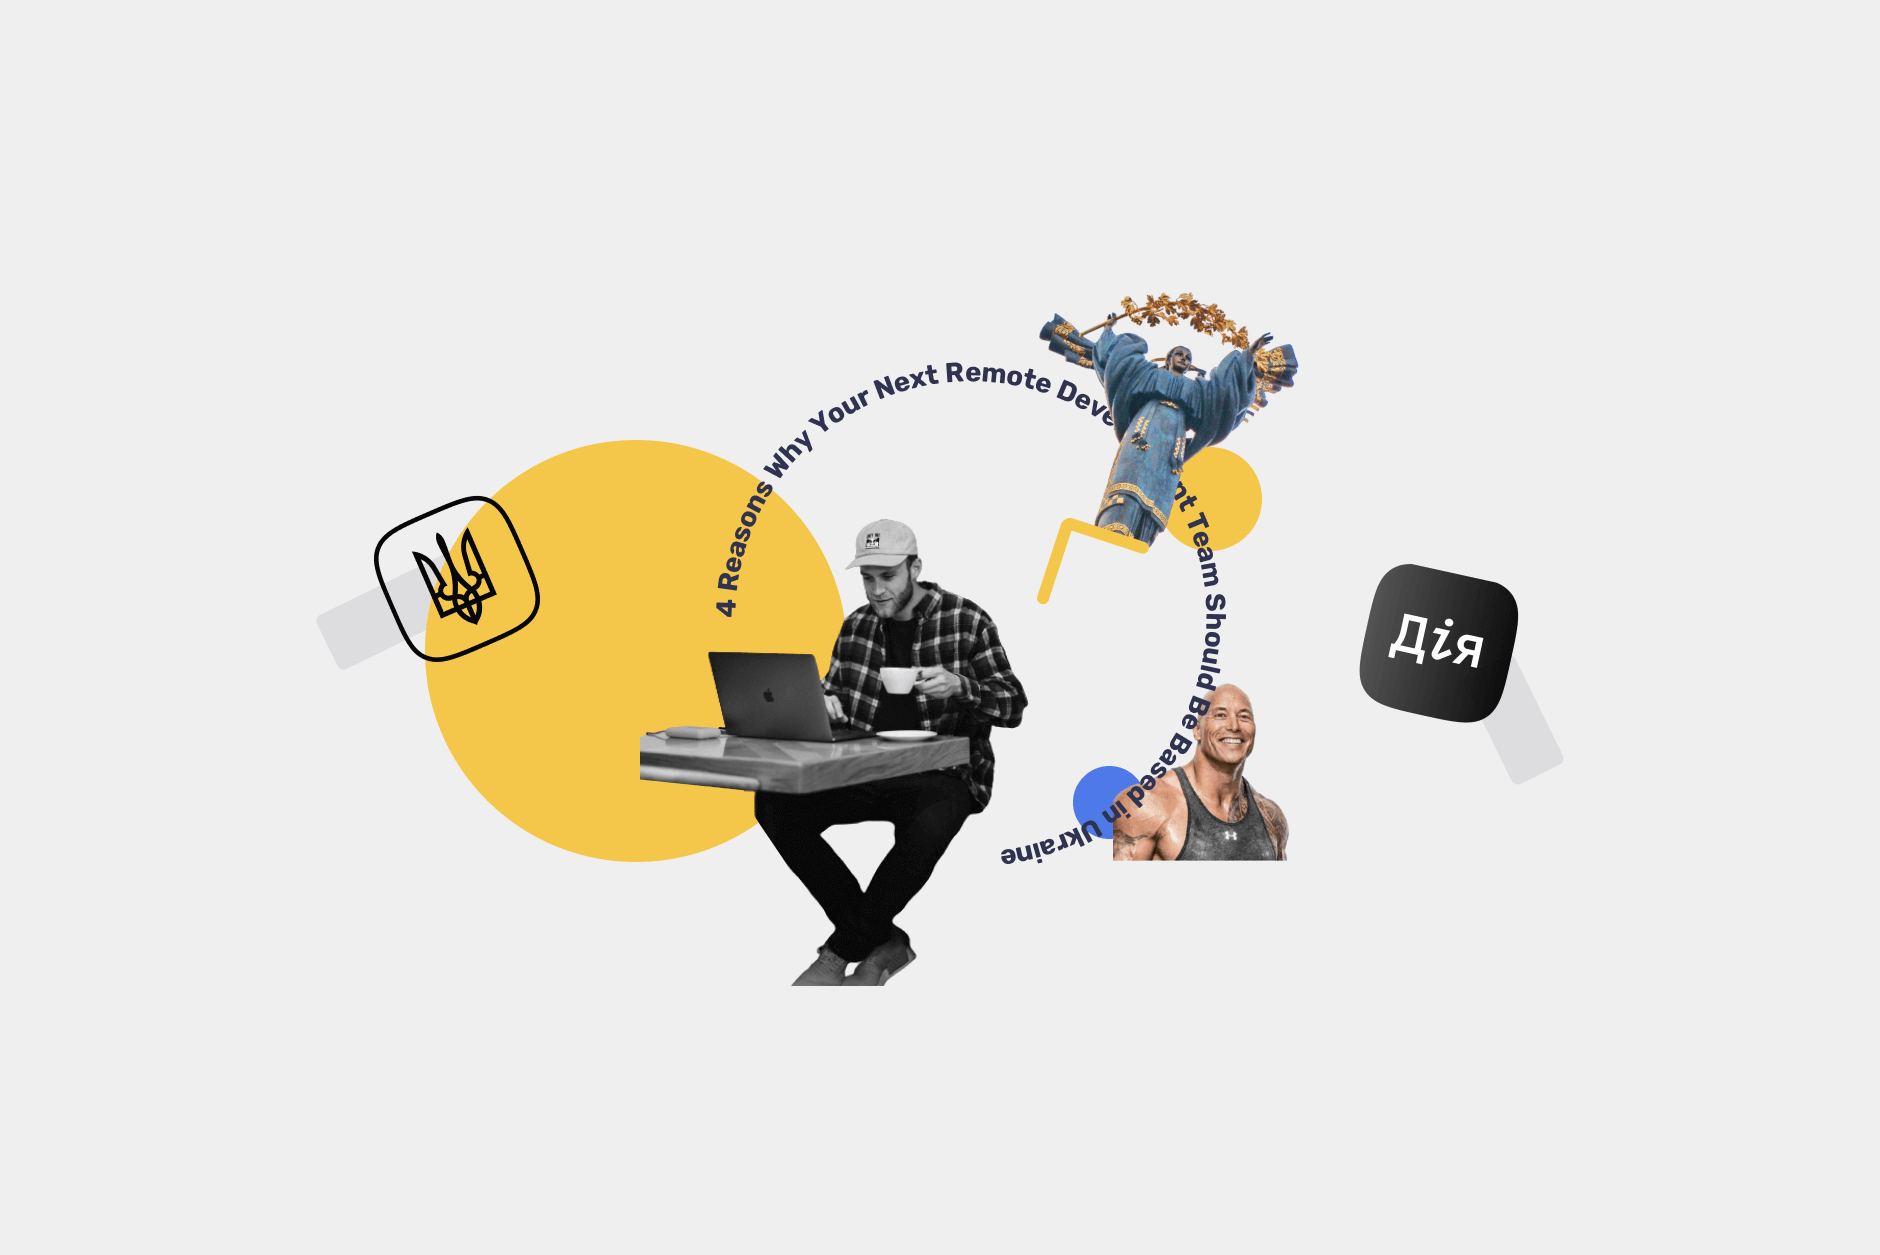 4 Reasons to Hire Your Next Remote Development Team in Ukraine